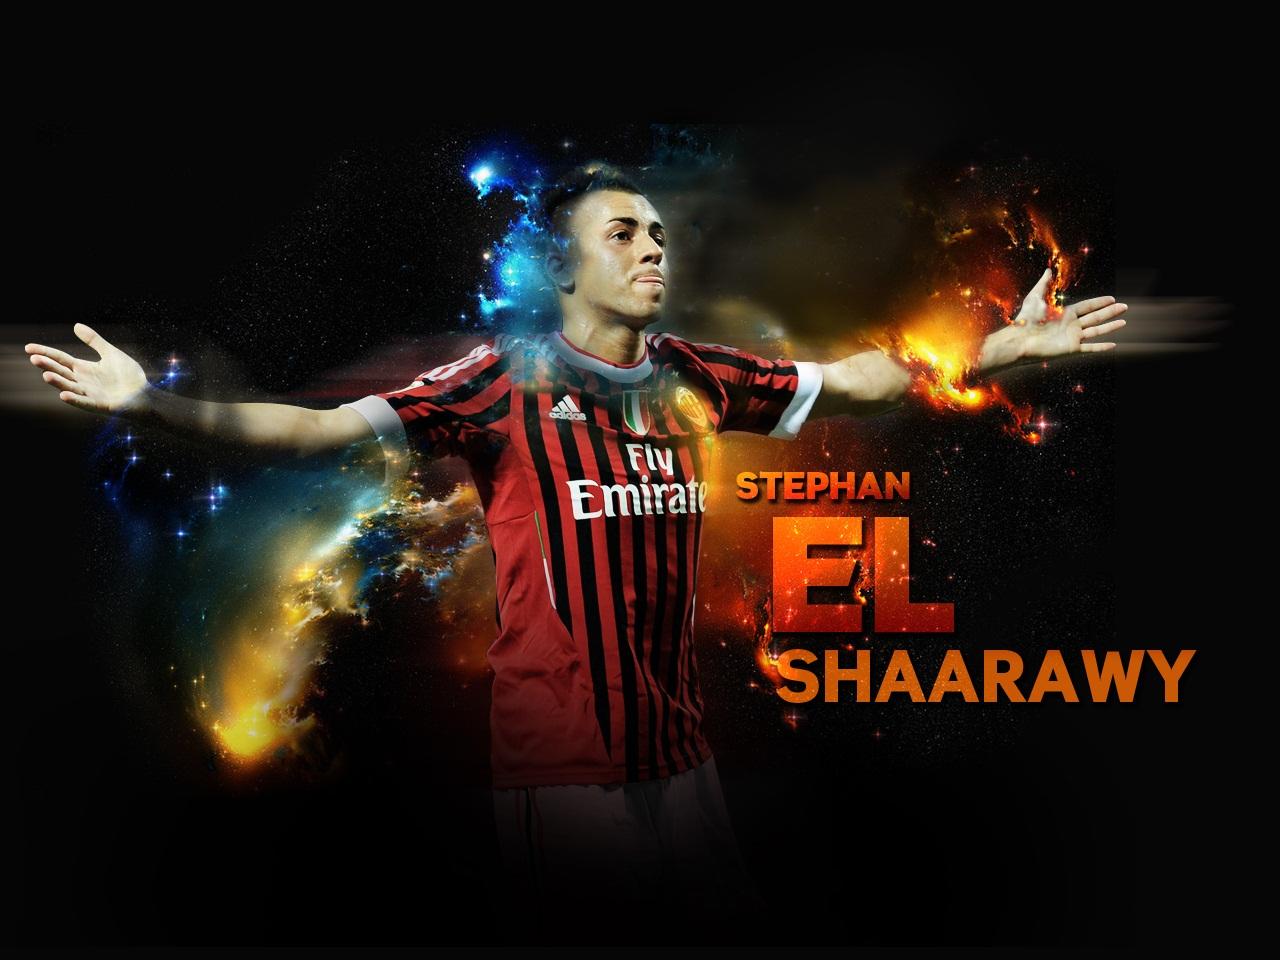 http://4.bp.blogspot.com/-62DTkMVwbAY/UAfNF4mKavI/AAAAAAAAEUI/Q_Rc7OrMiW8/s1600/stephan-el-shaarawy-wallpaper.jpg